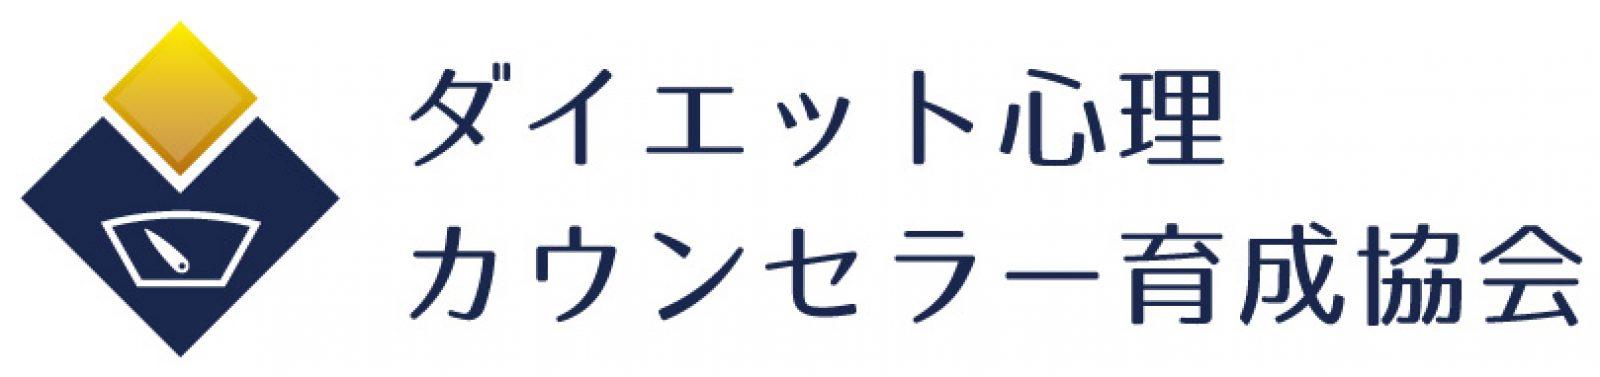 cropped-Diet-Psychology-Counselor-Training-Association-logo-01-2.jpg